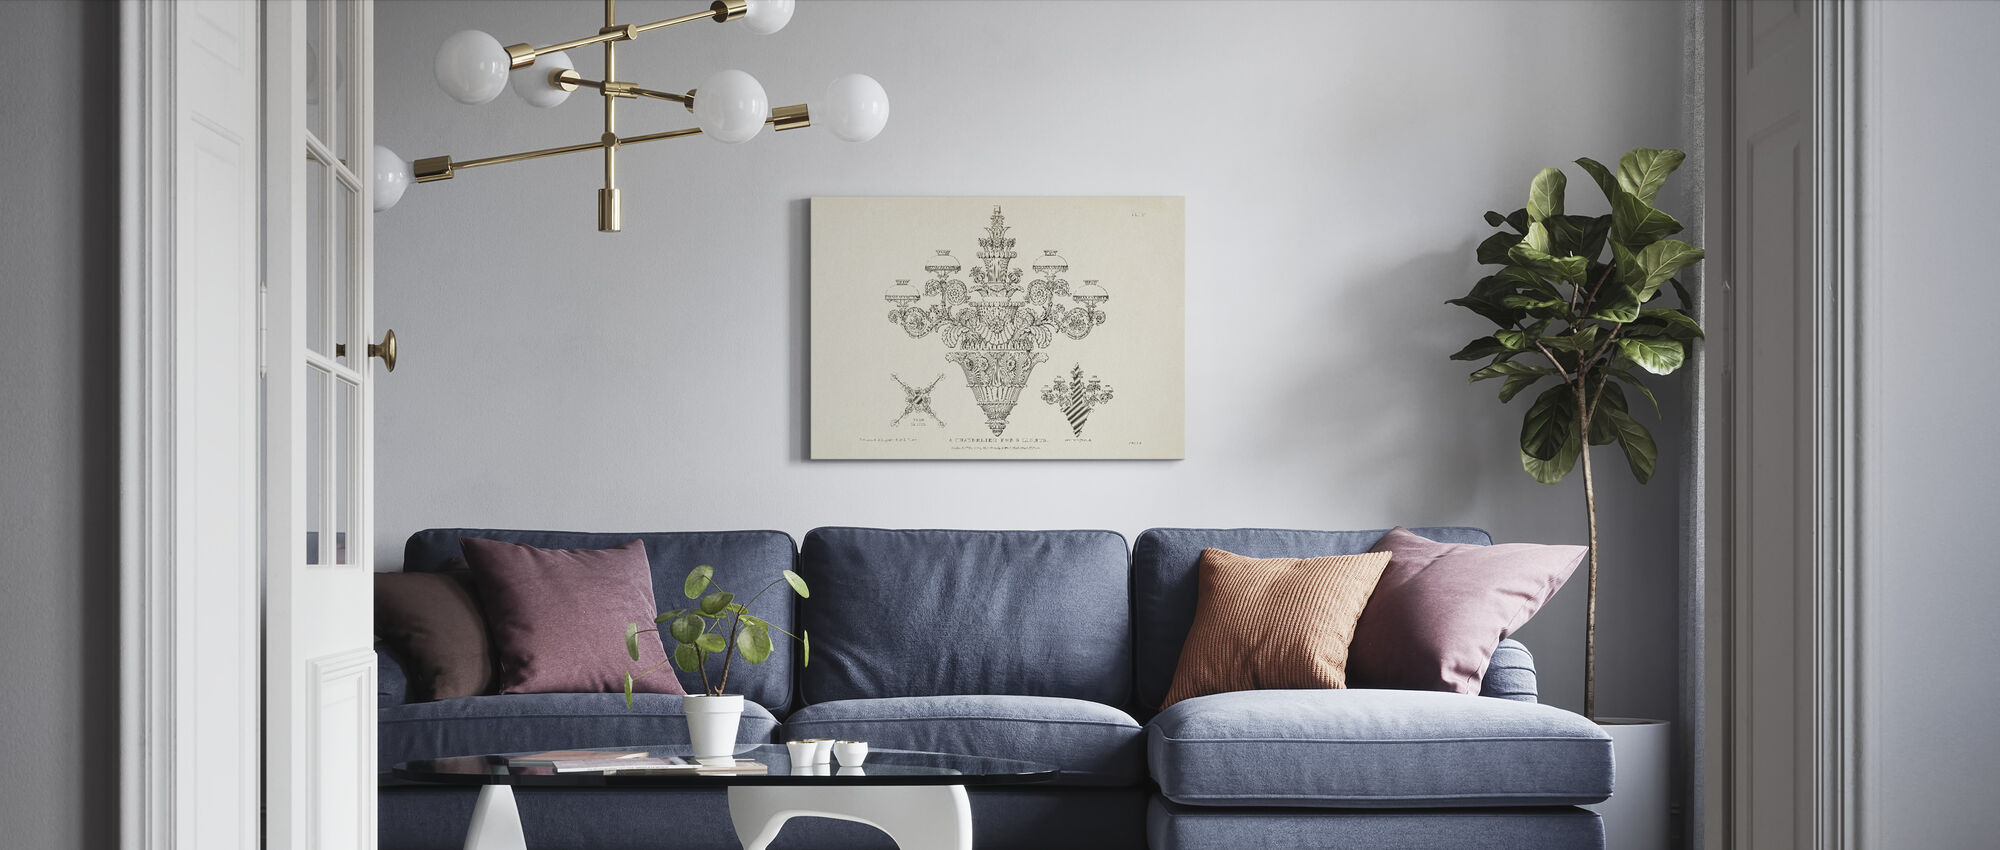 Ornamental Metal Work X Light - Canvas print - Living Room